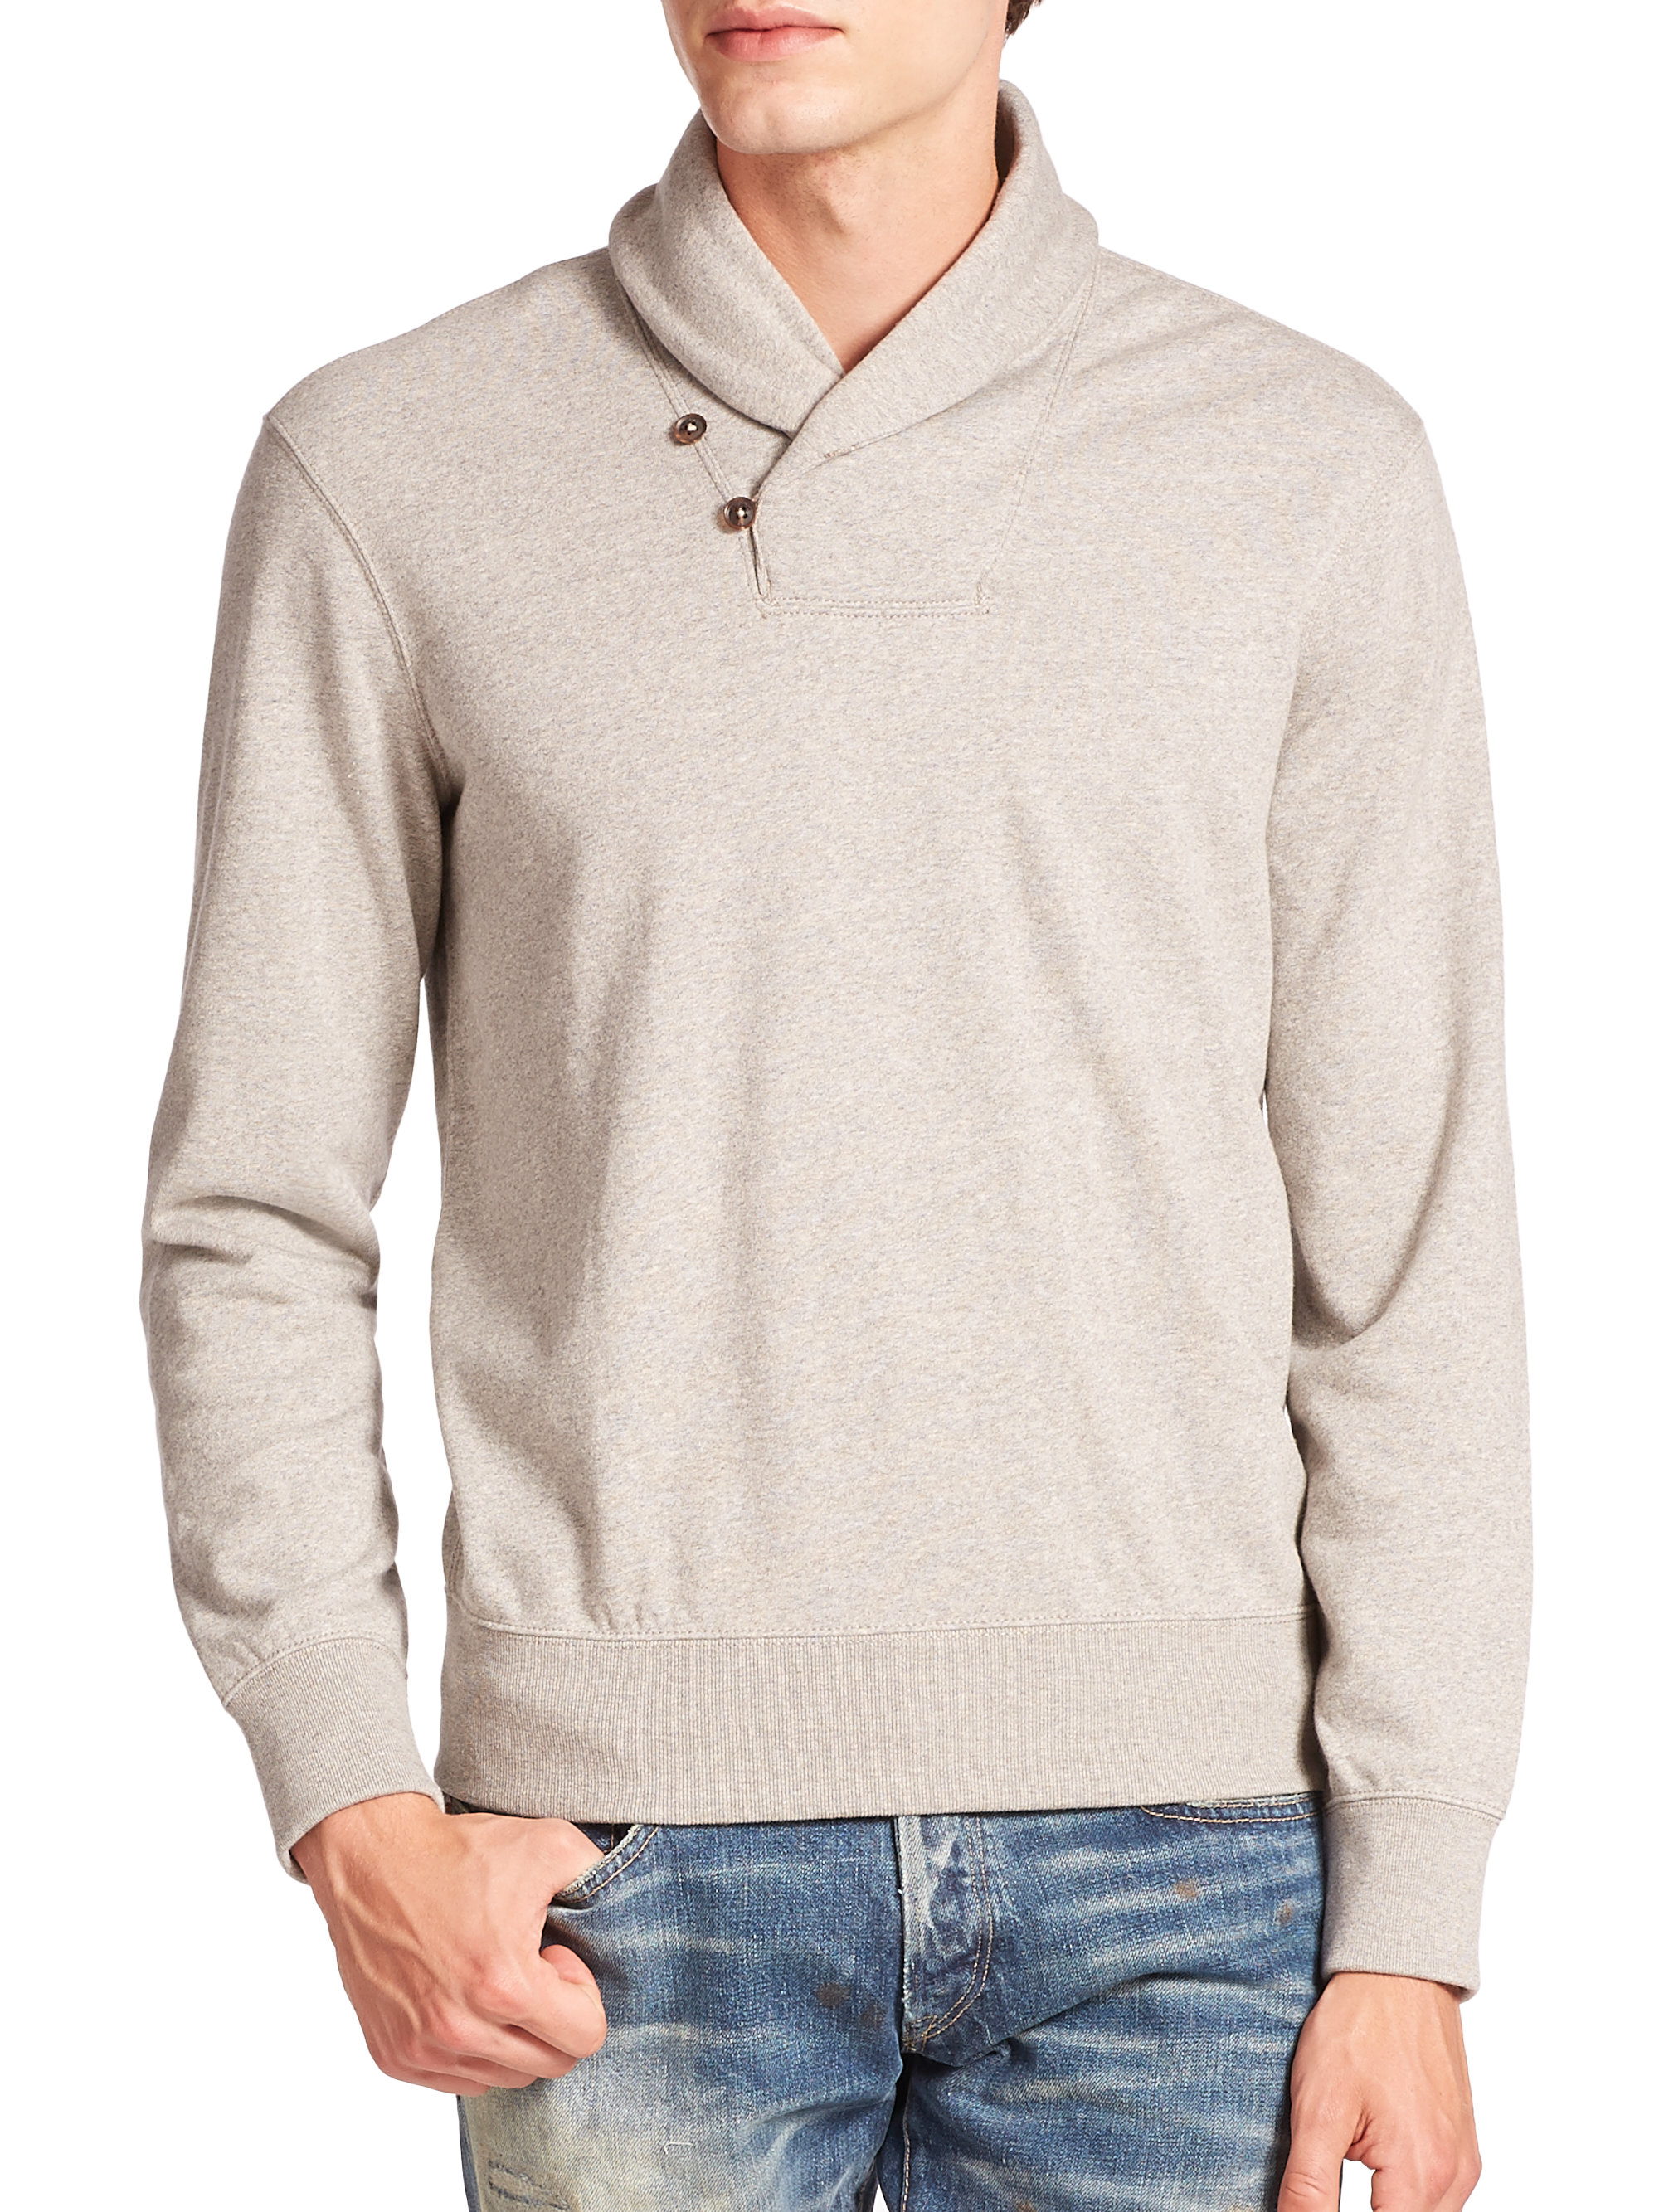 Polo ralph lauren Shawl Collar Fleece Pullover in Gray for